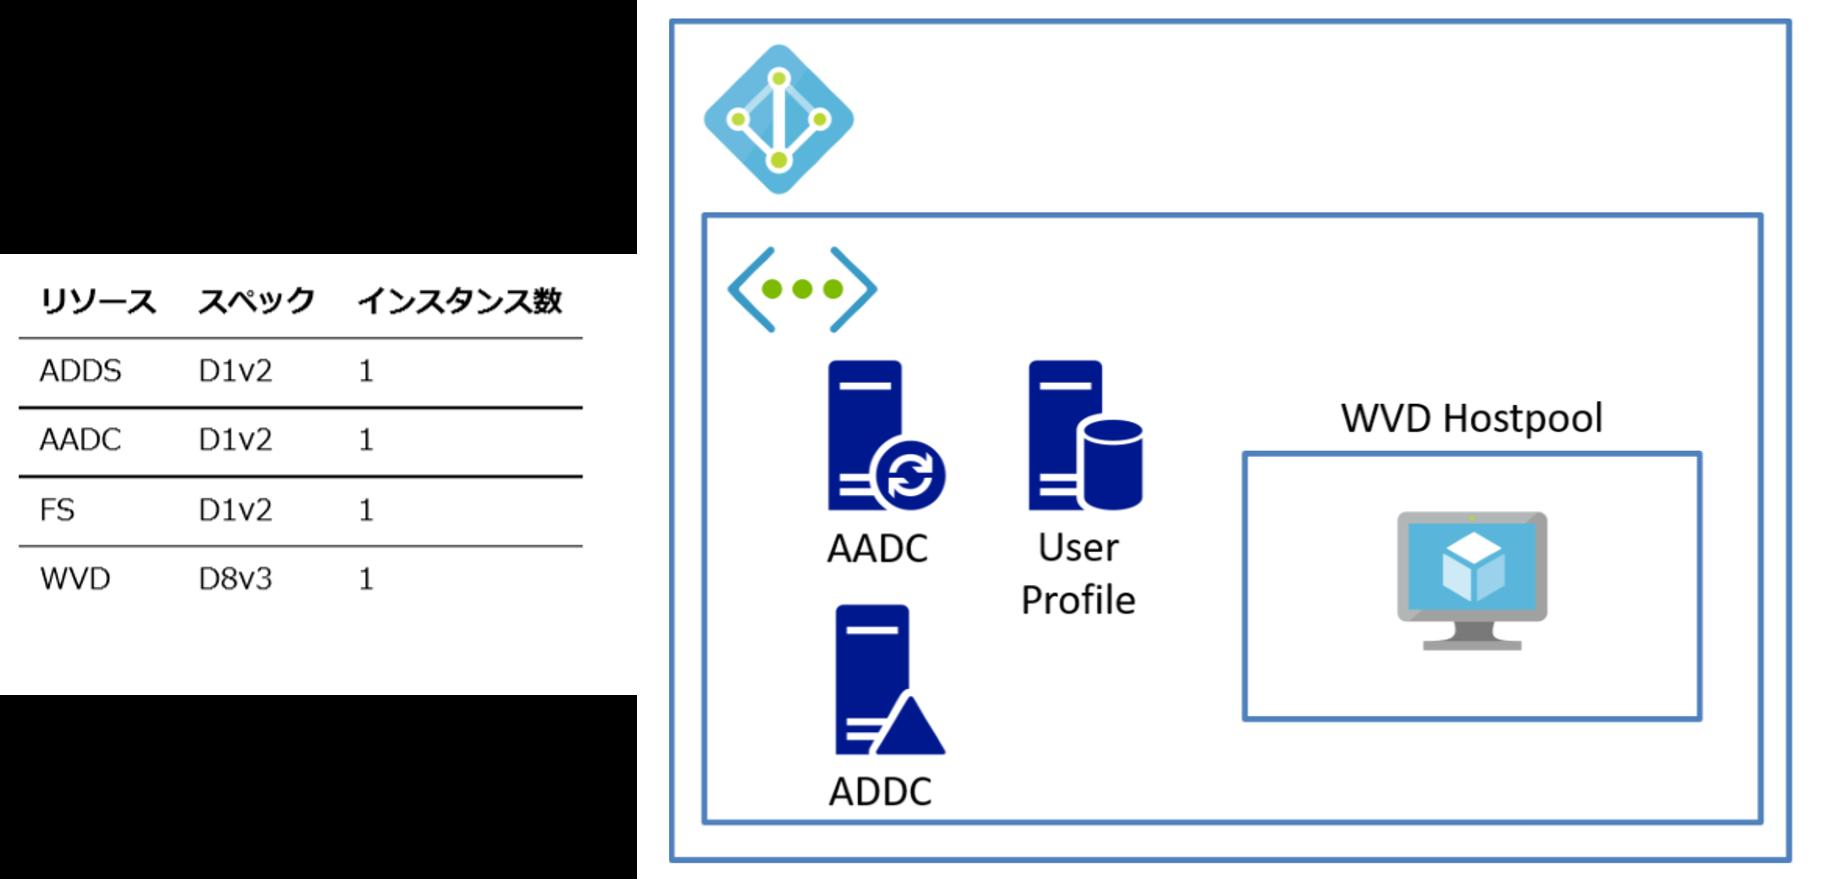 Azure上でリソースを構築